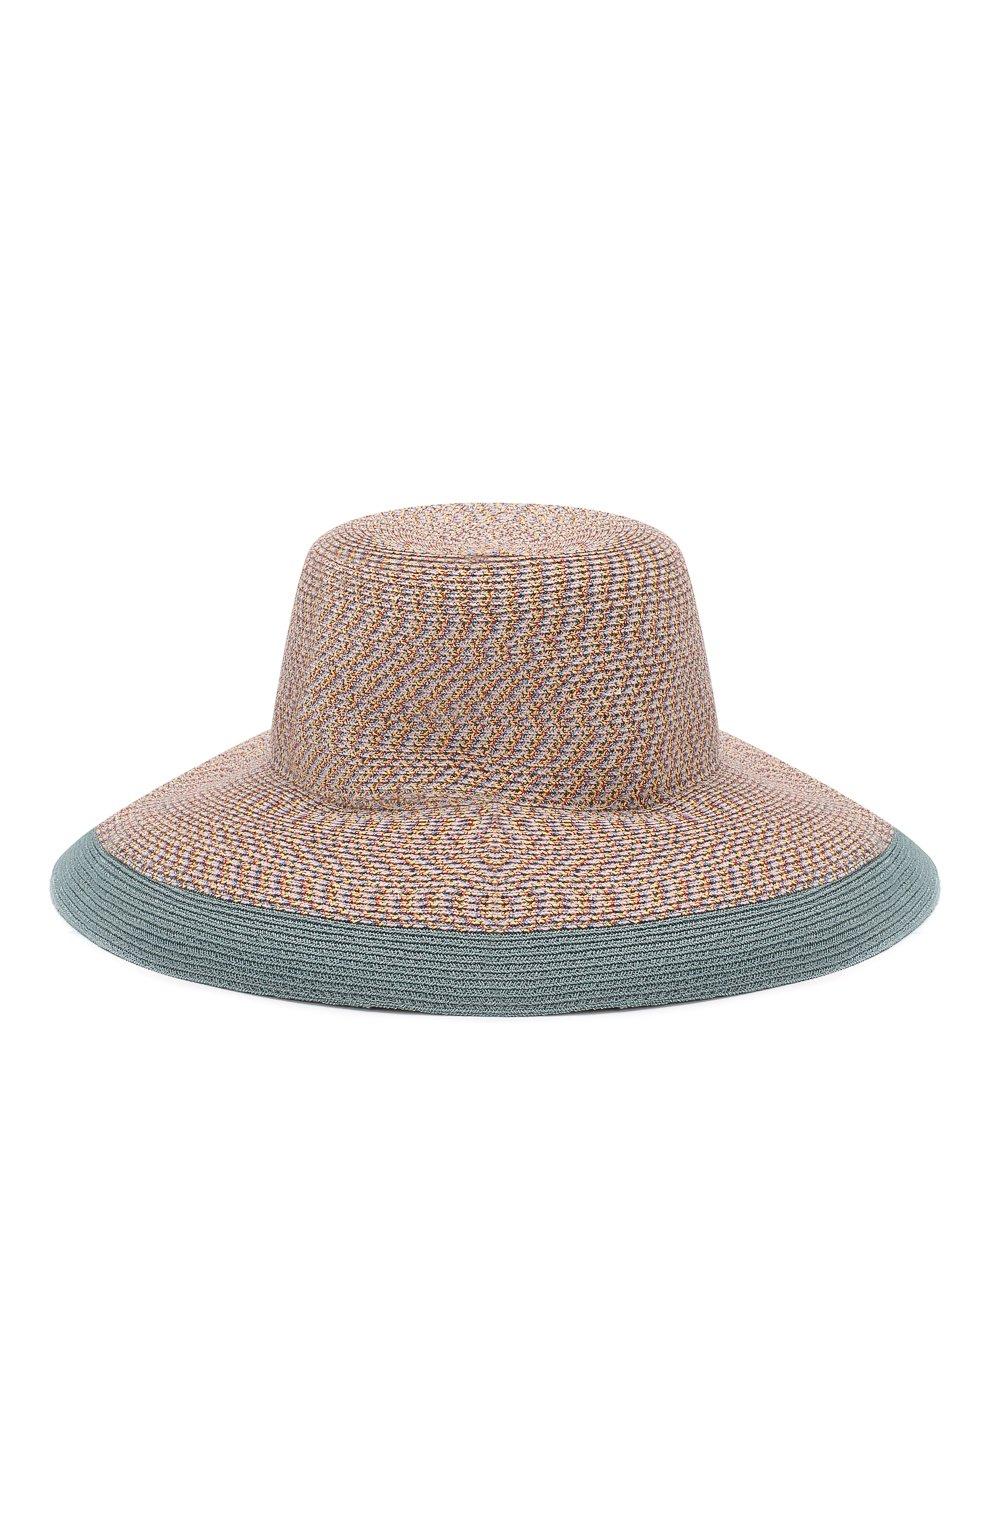 Плетеная шляпа Inverni разноцветного цвета | Фото №2